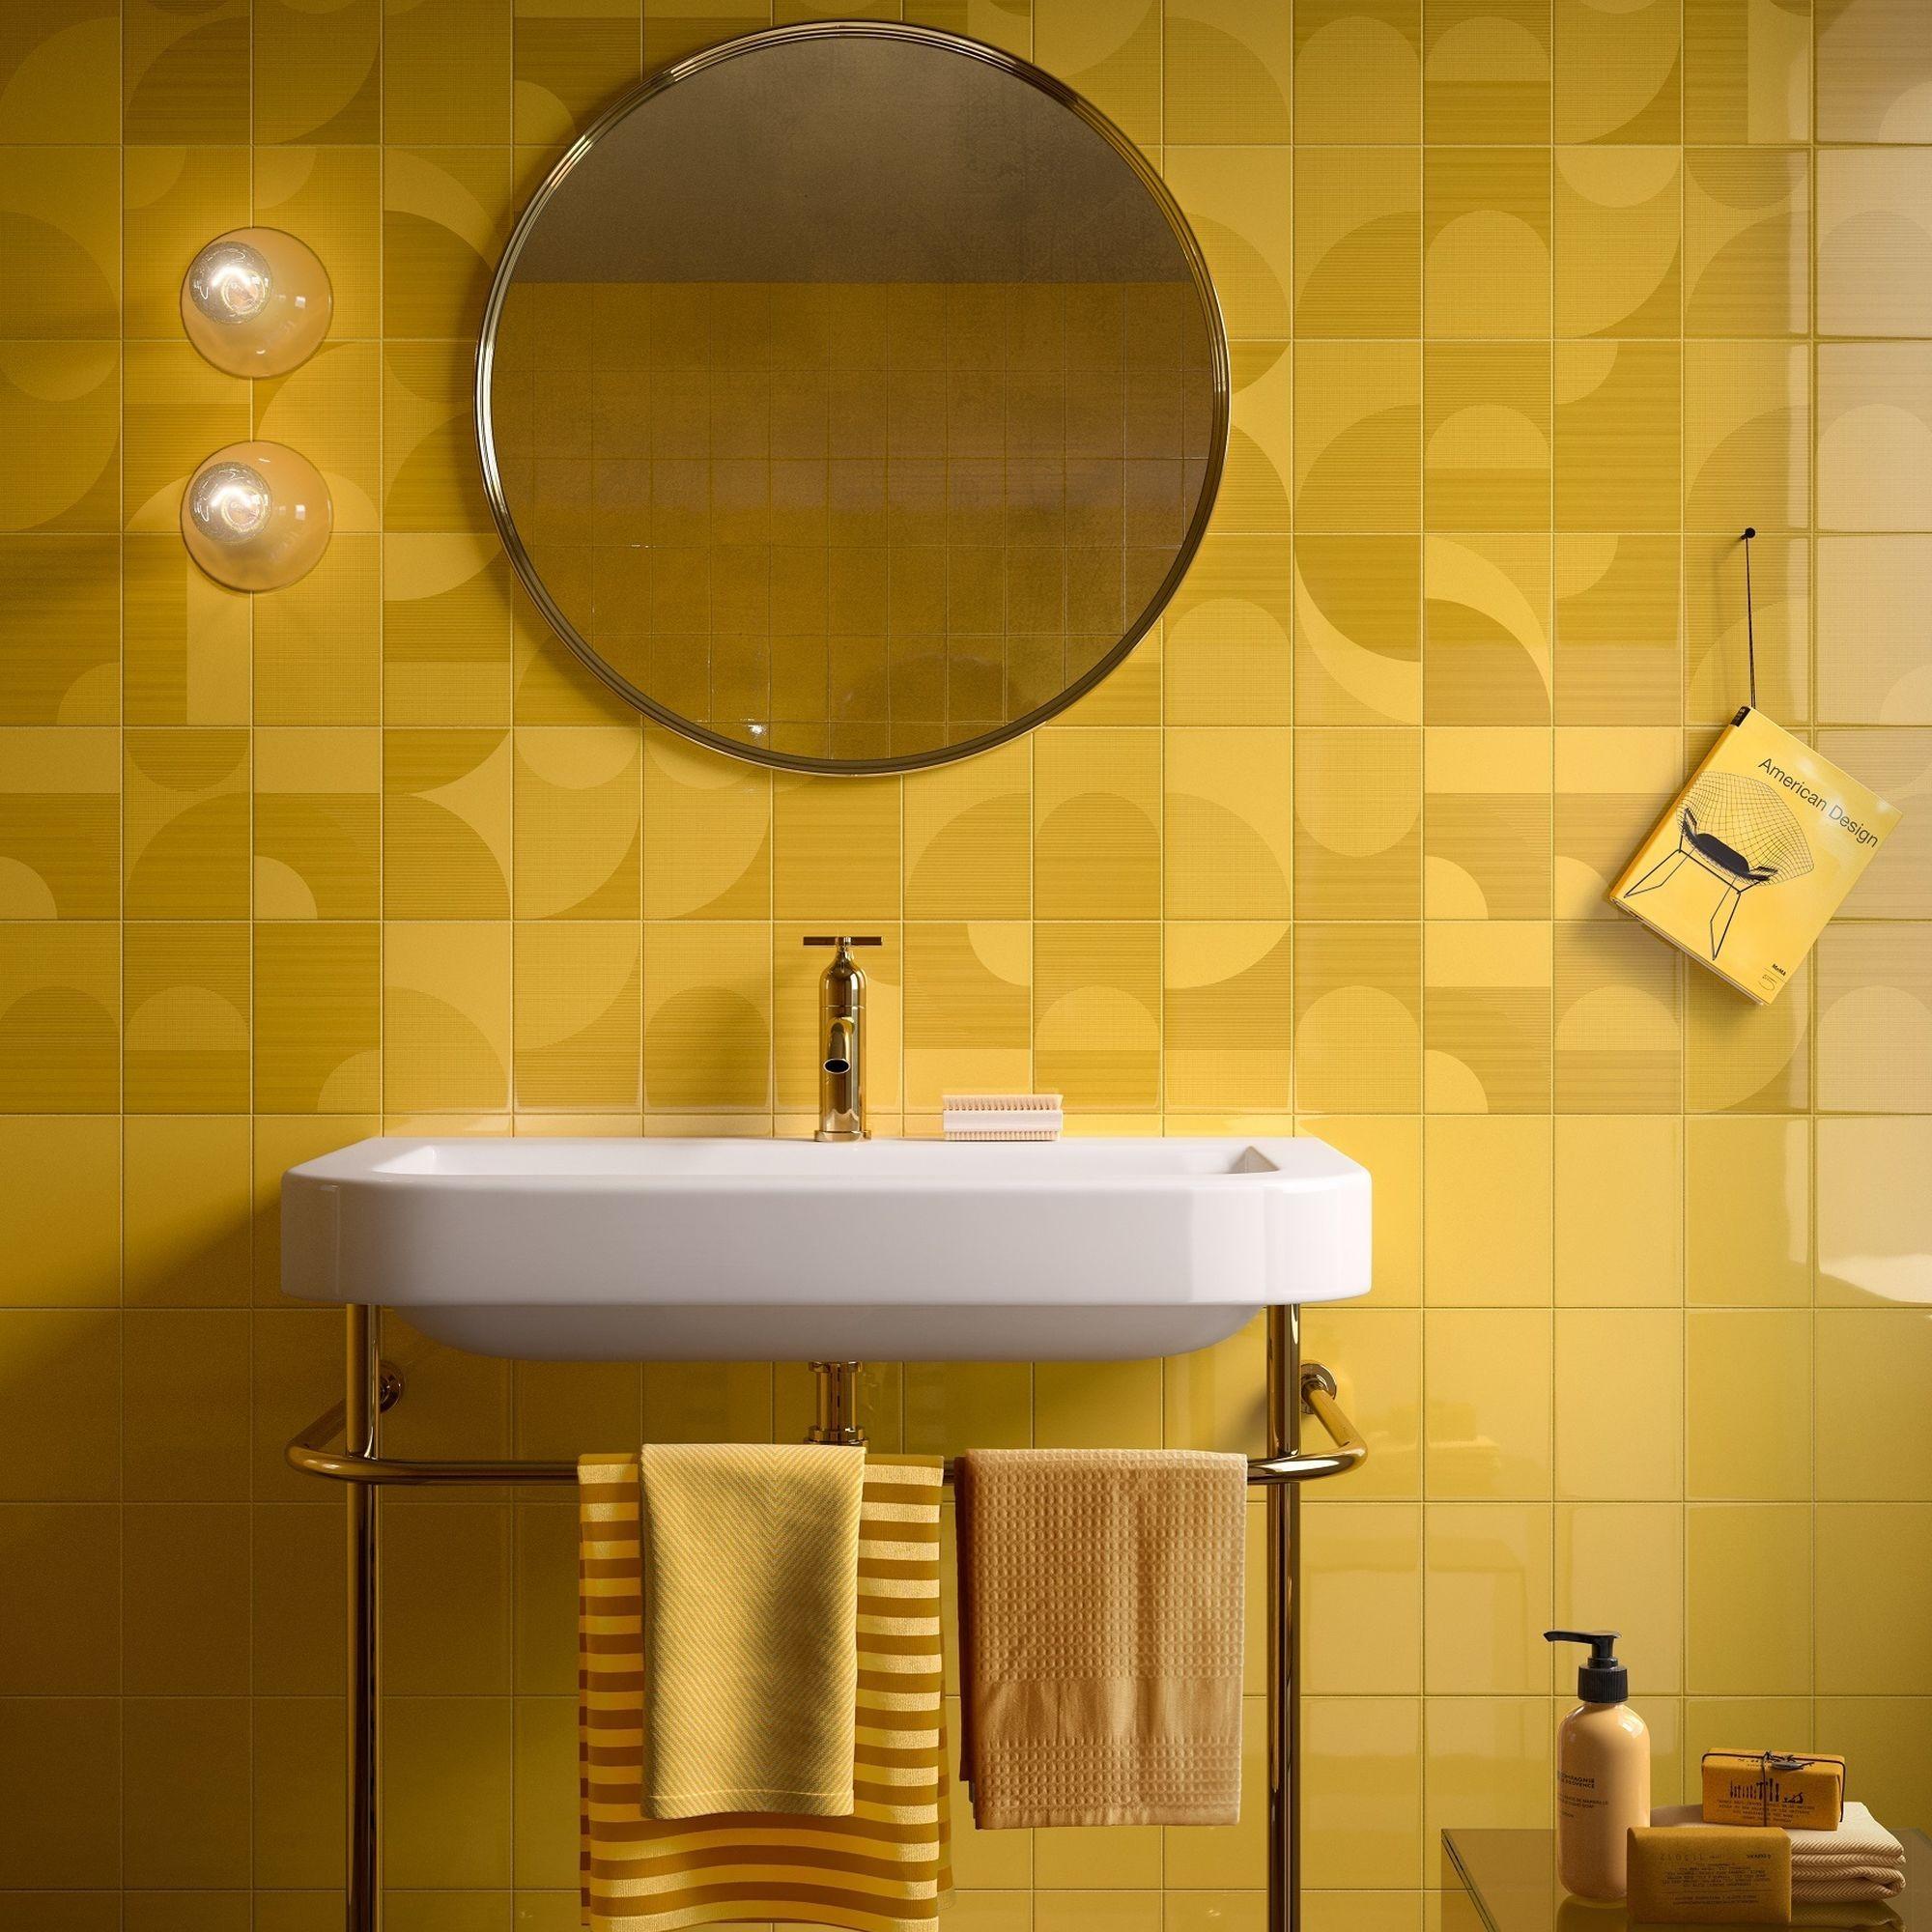 carnaby-yellow-room-setting-c2fcbcd136f3a9c72d5c10942bc7f17d.jpg